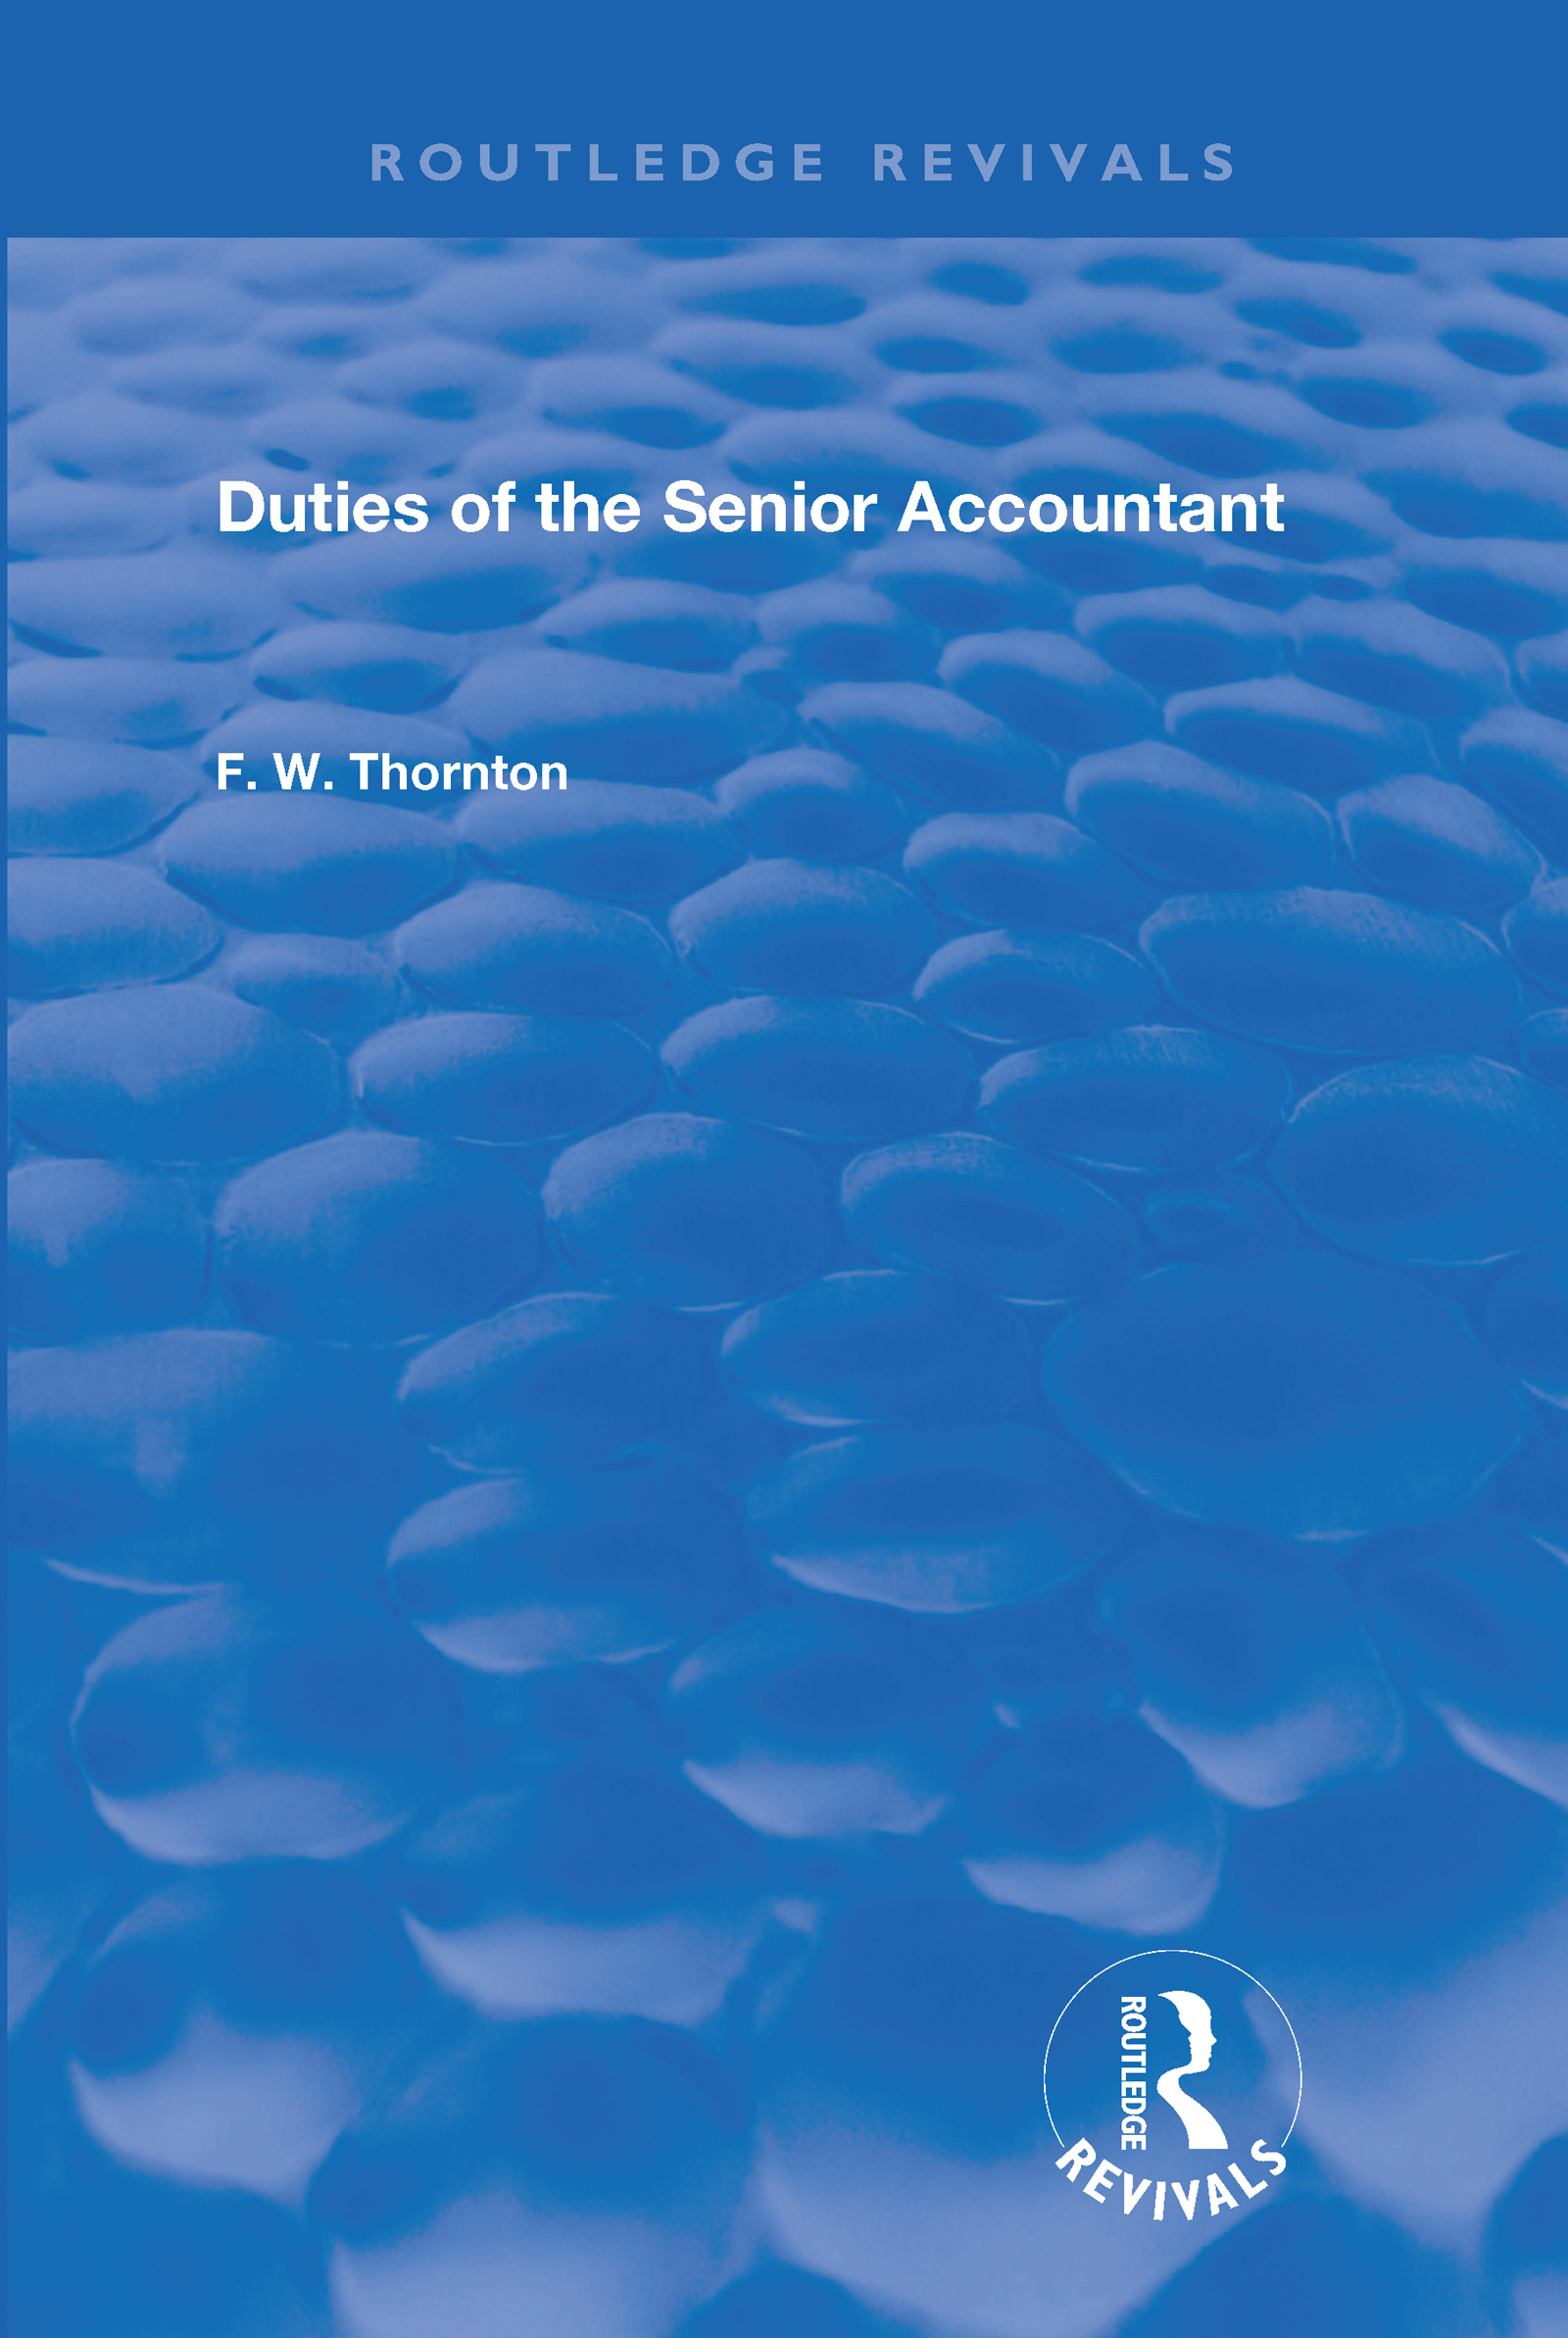 Duties of the Senior Accountant